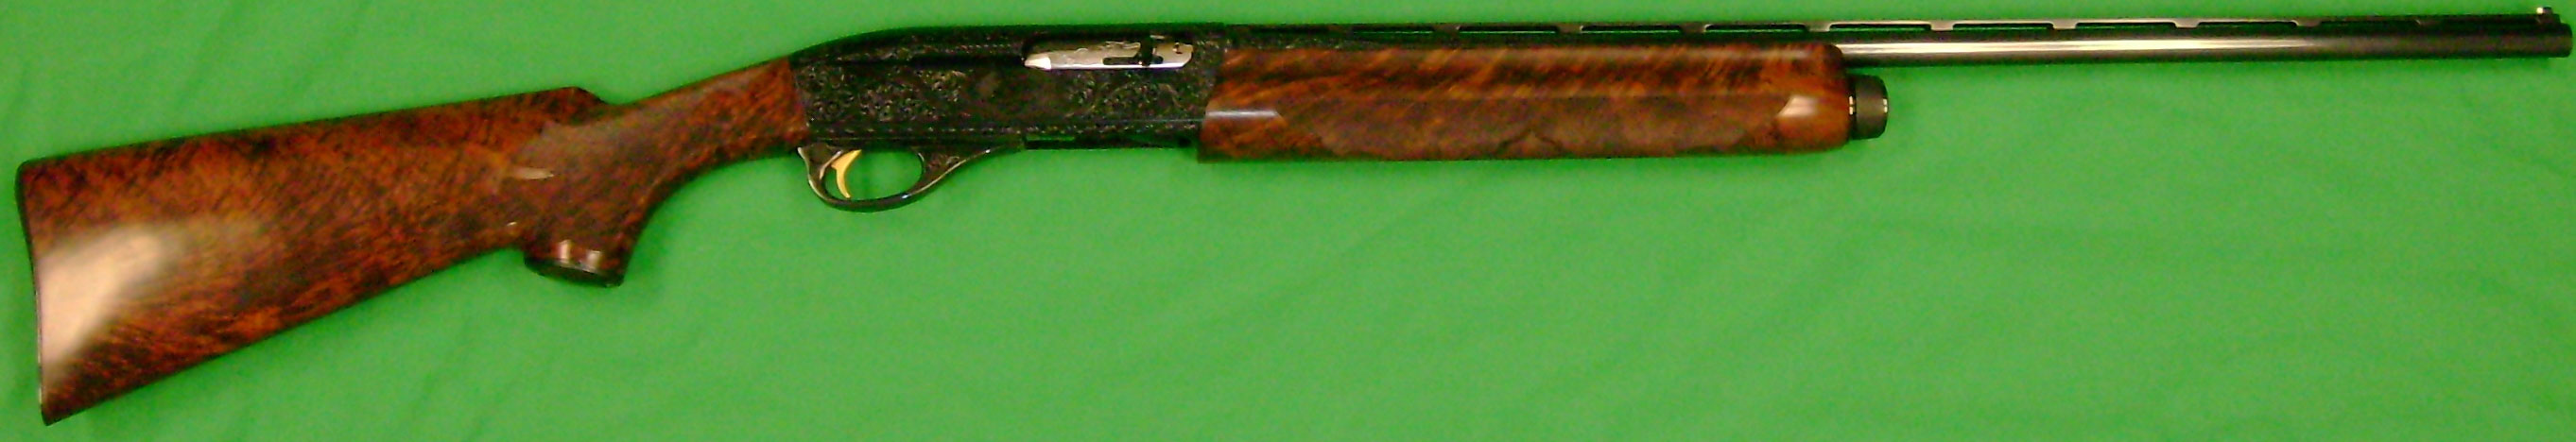 RGS_raffle_110630_Remington_1100_FGrade_3_RGS